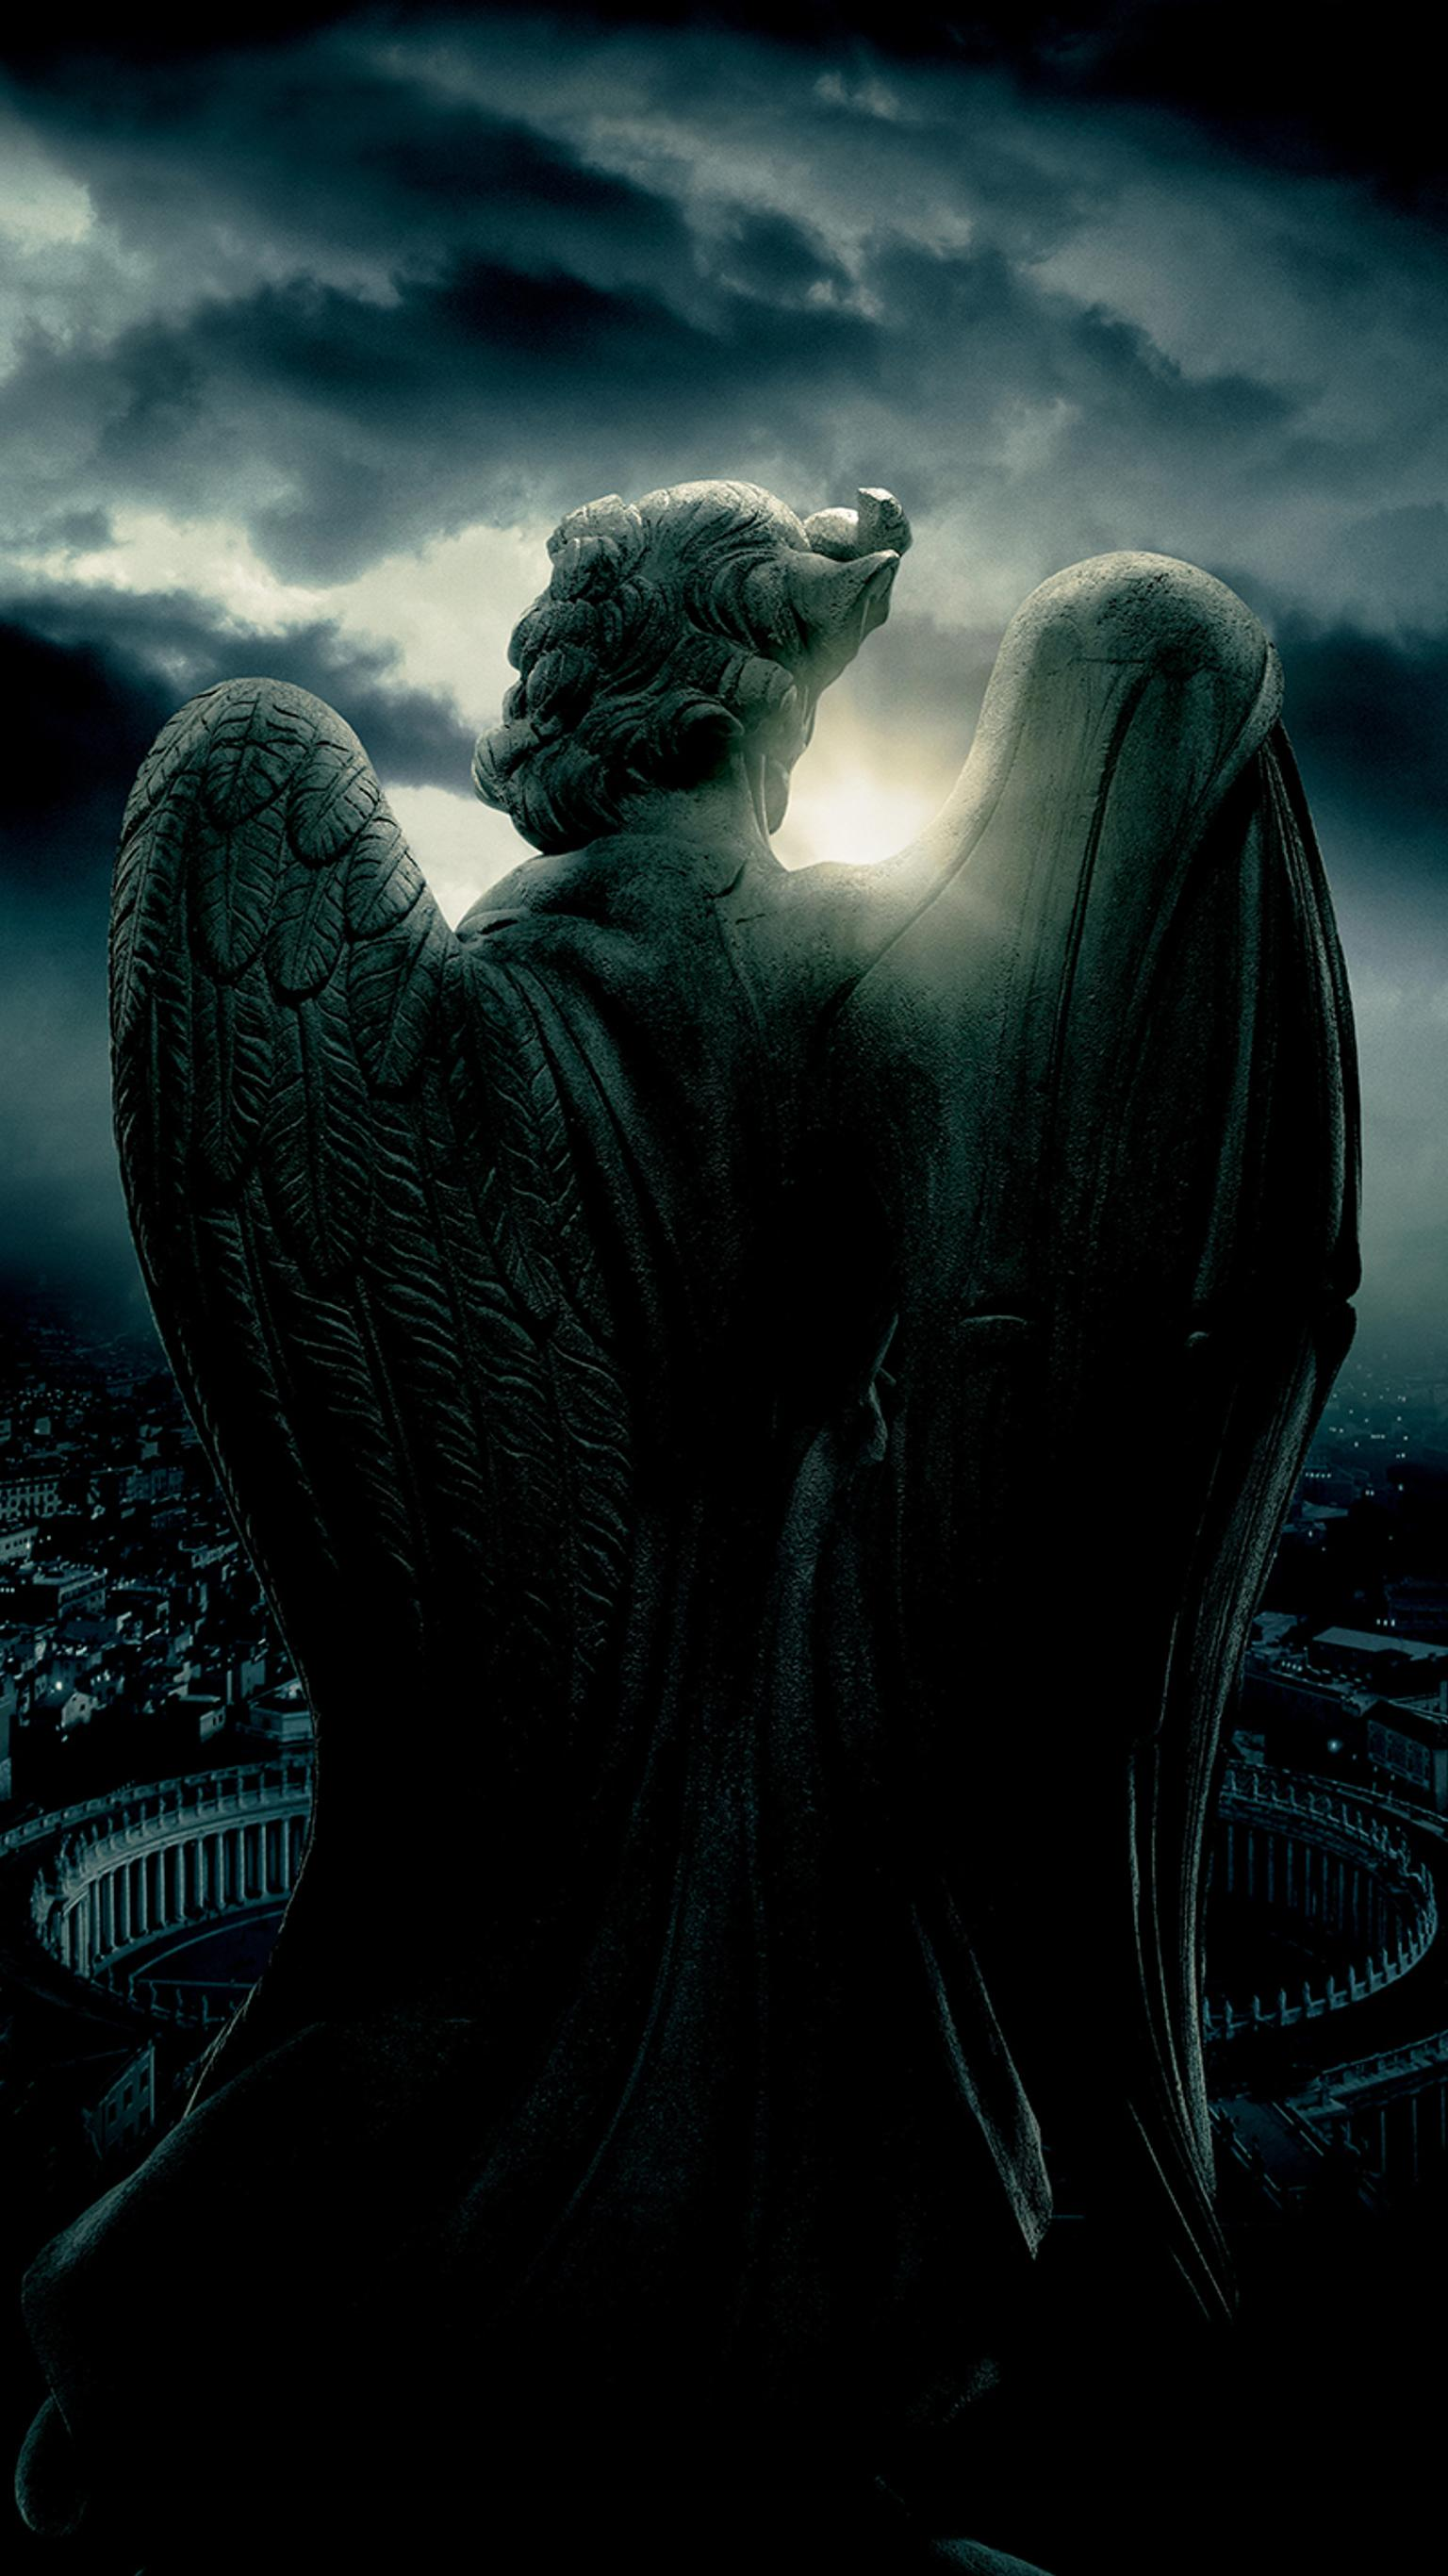 Angel And Devil Wallpaper : angel, devil, wallpaper, Angels, Demons, Wallpapers, Backgrounds, WallpaperAccess